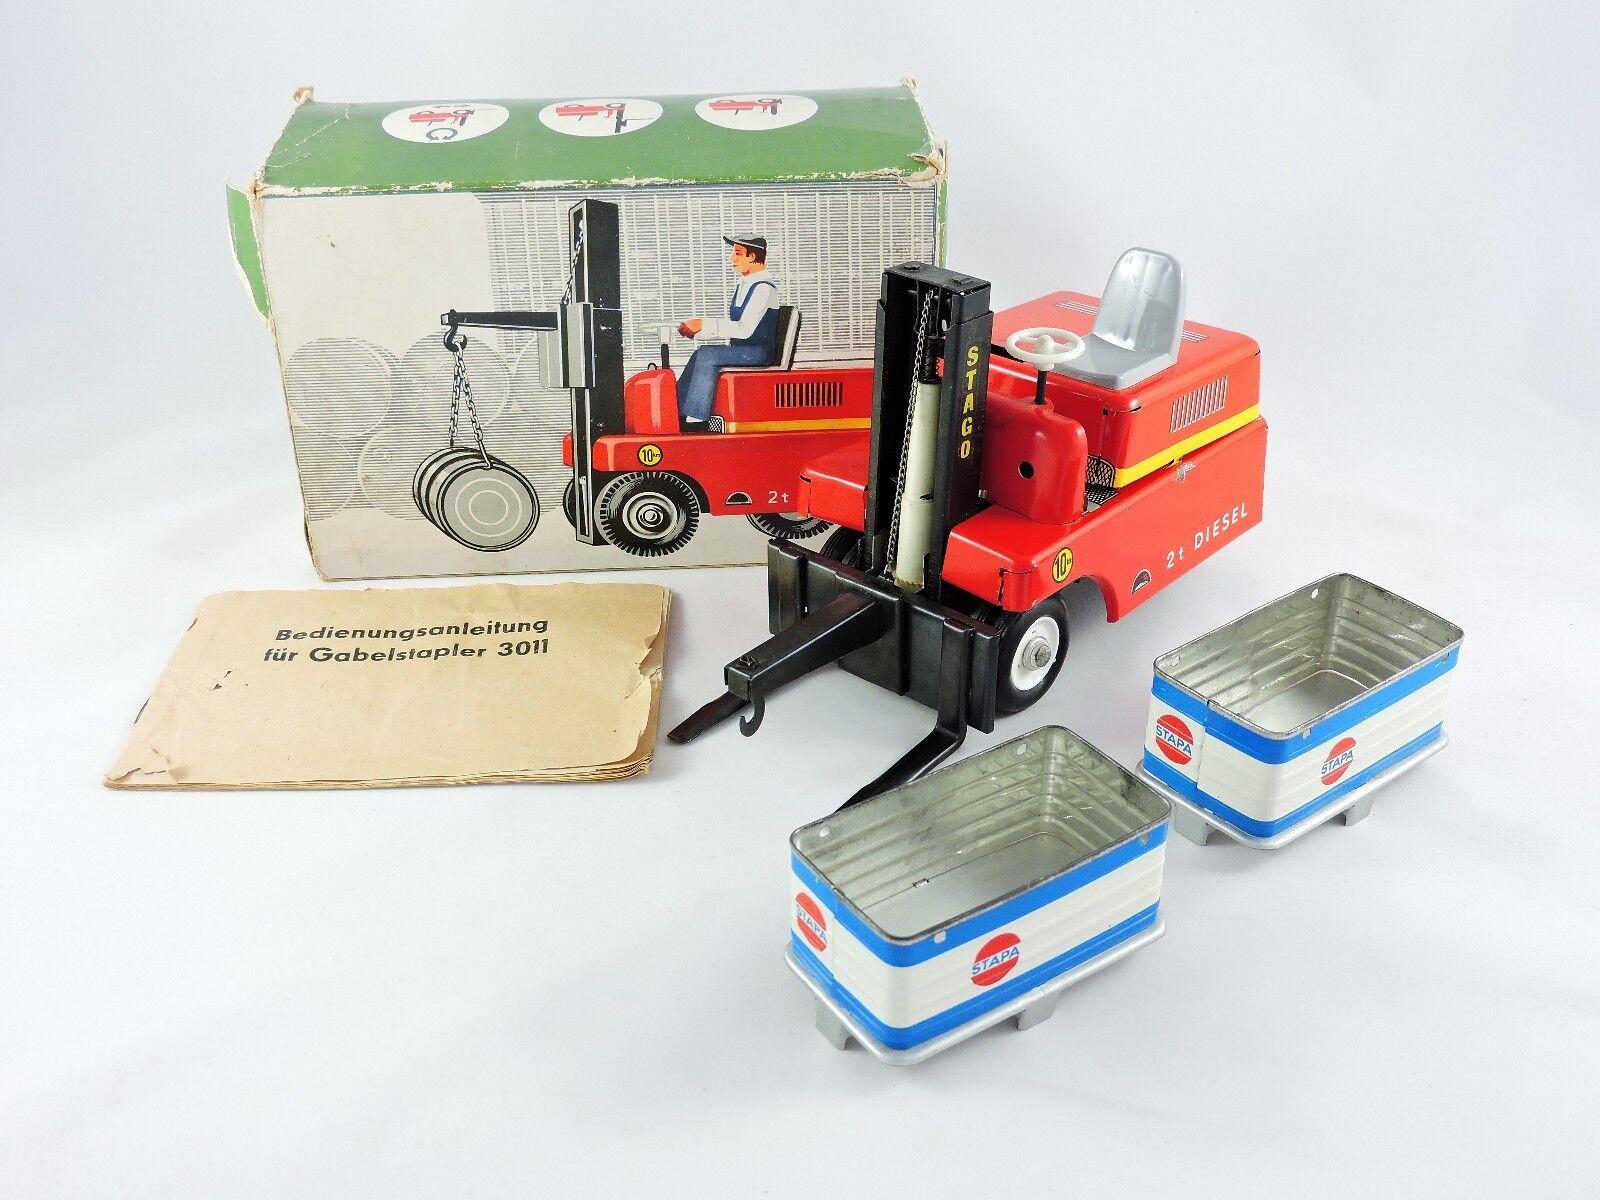 Battery Operated STAGOR Forklift truck tin Spielzeug MS Veb MSB German 3011 Jahr